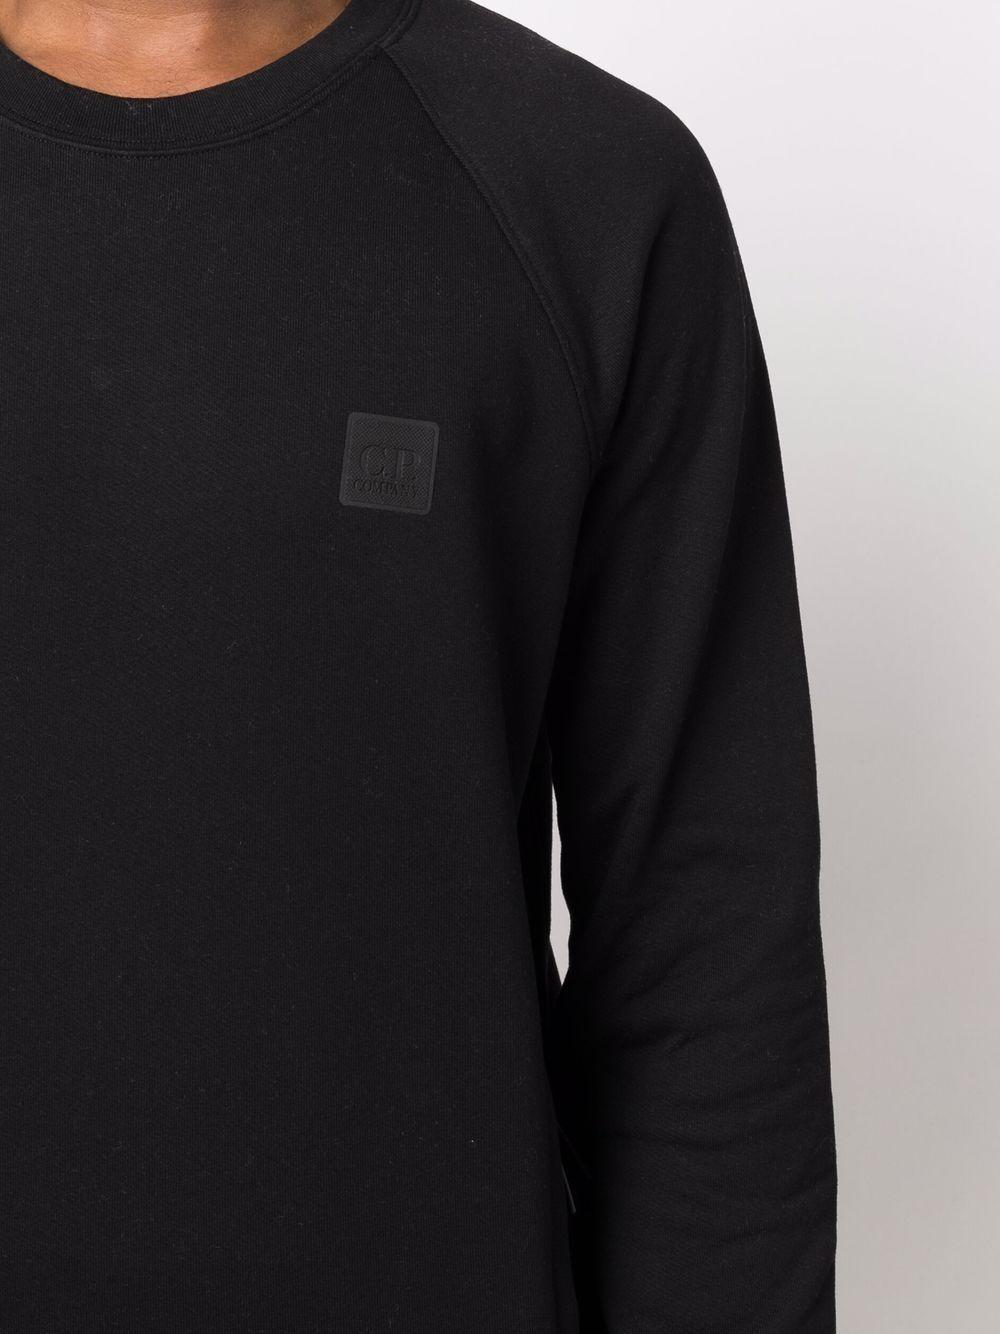 crew neck sweatshirt man black in cotton C.P. COMPANY   Sweatshirts   11CMSS064A005086W999